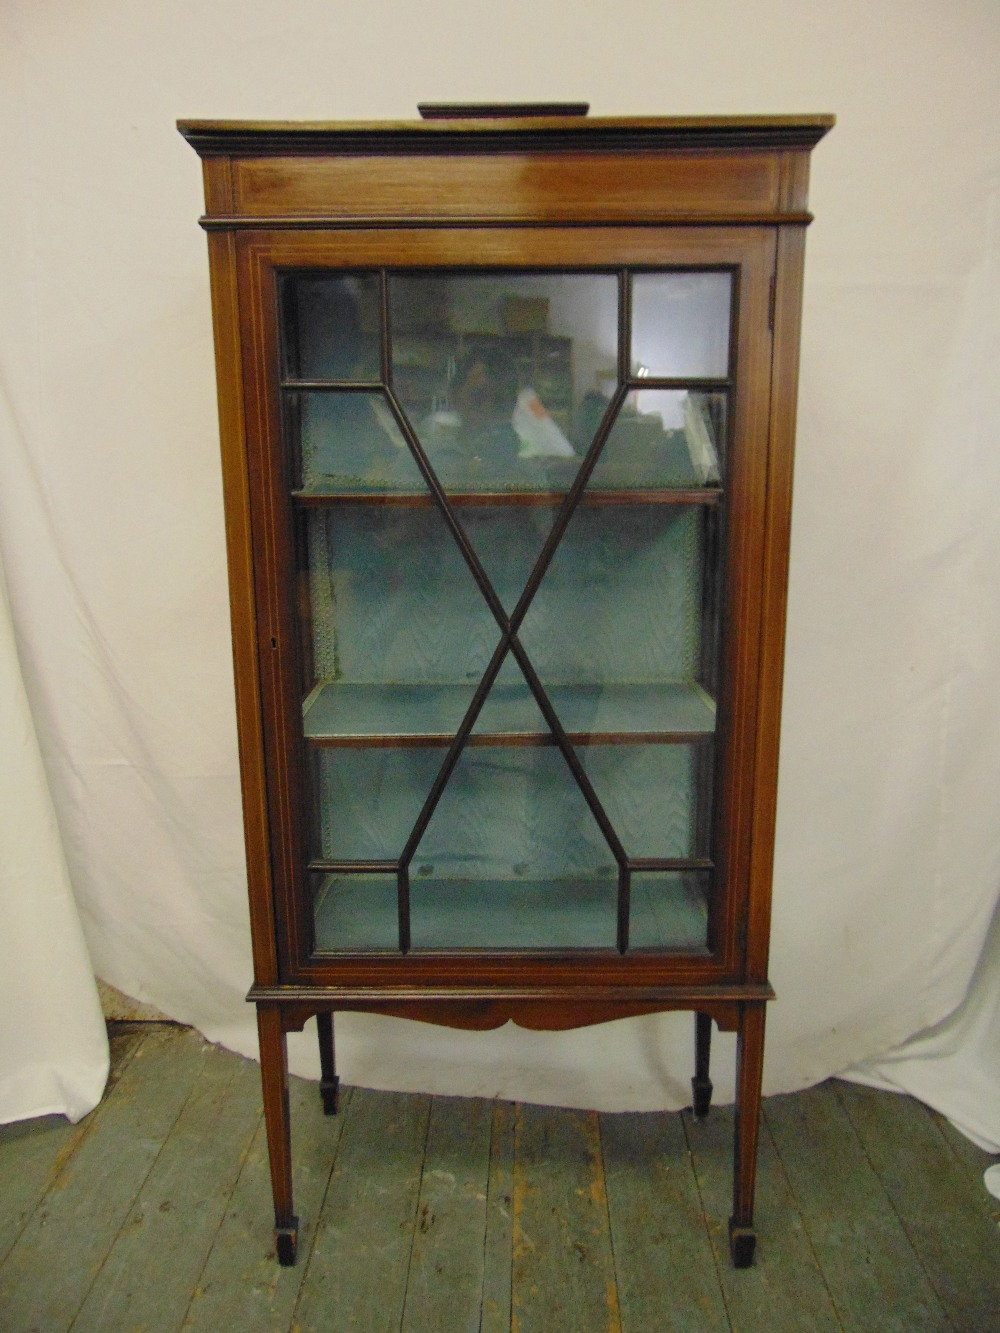 Lot 16 - An Edwardian rectangular mahogany glazed inlaid display cabinet on four tapering rectangular legs